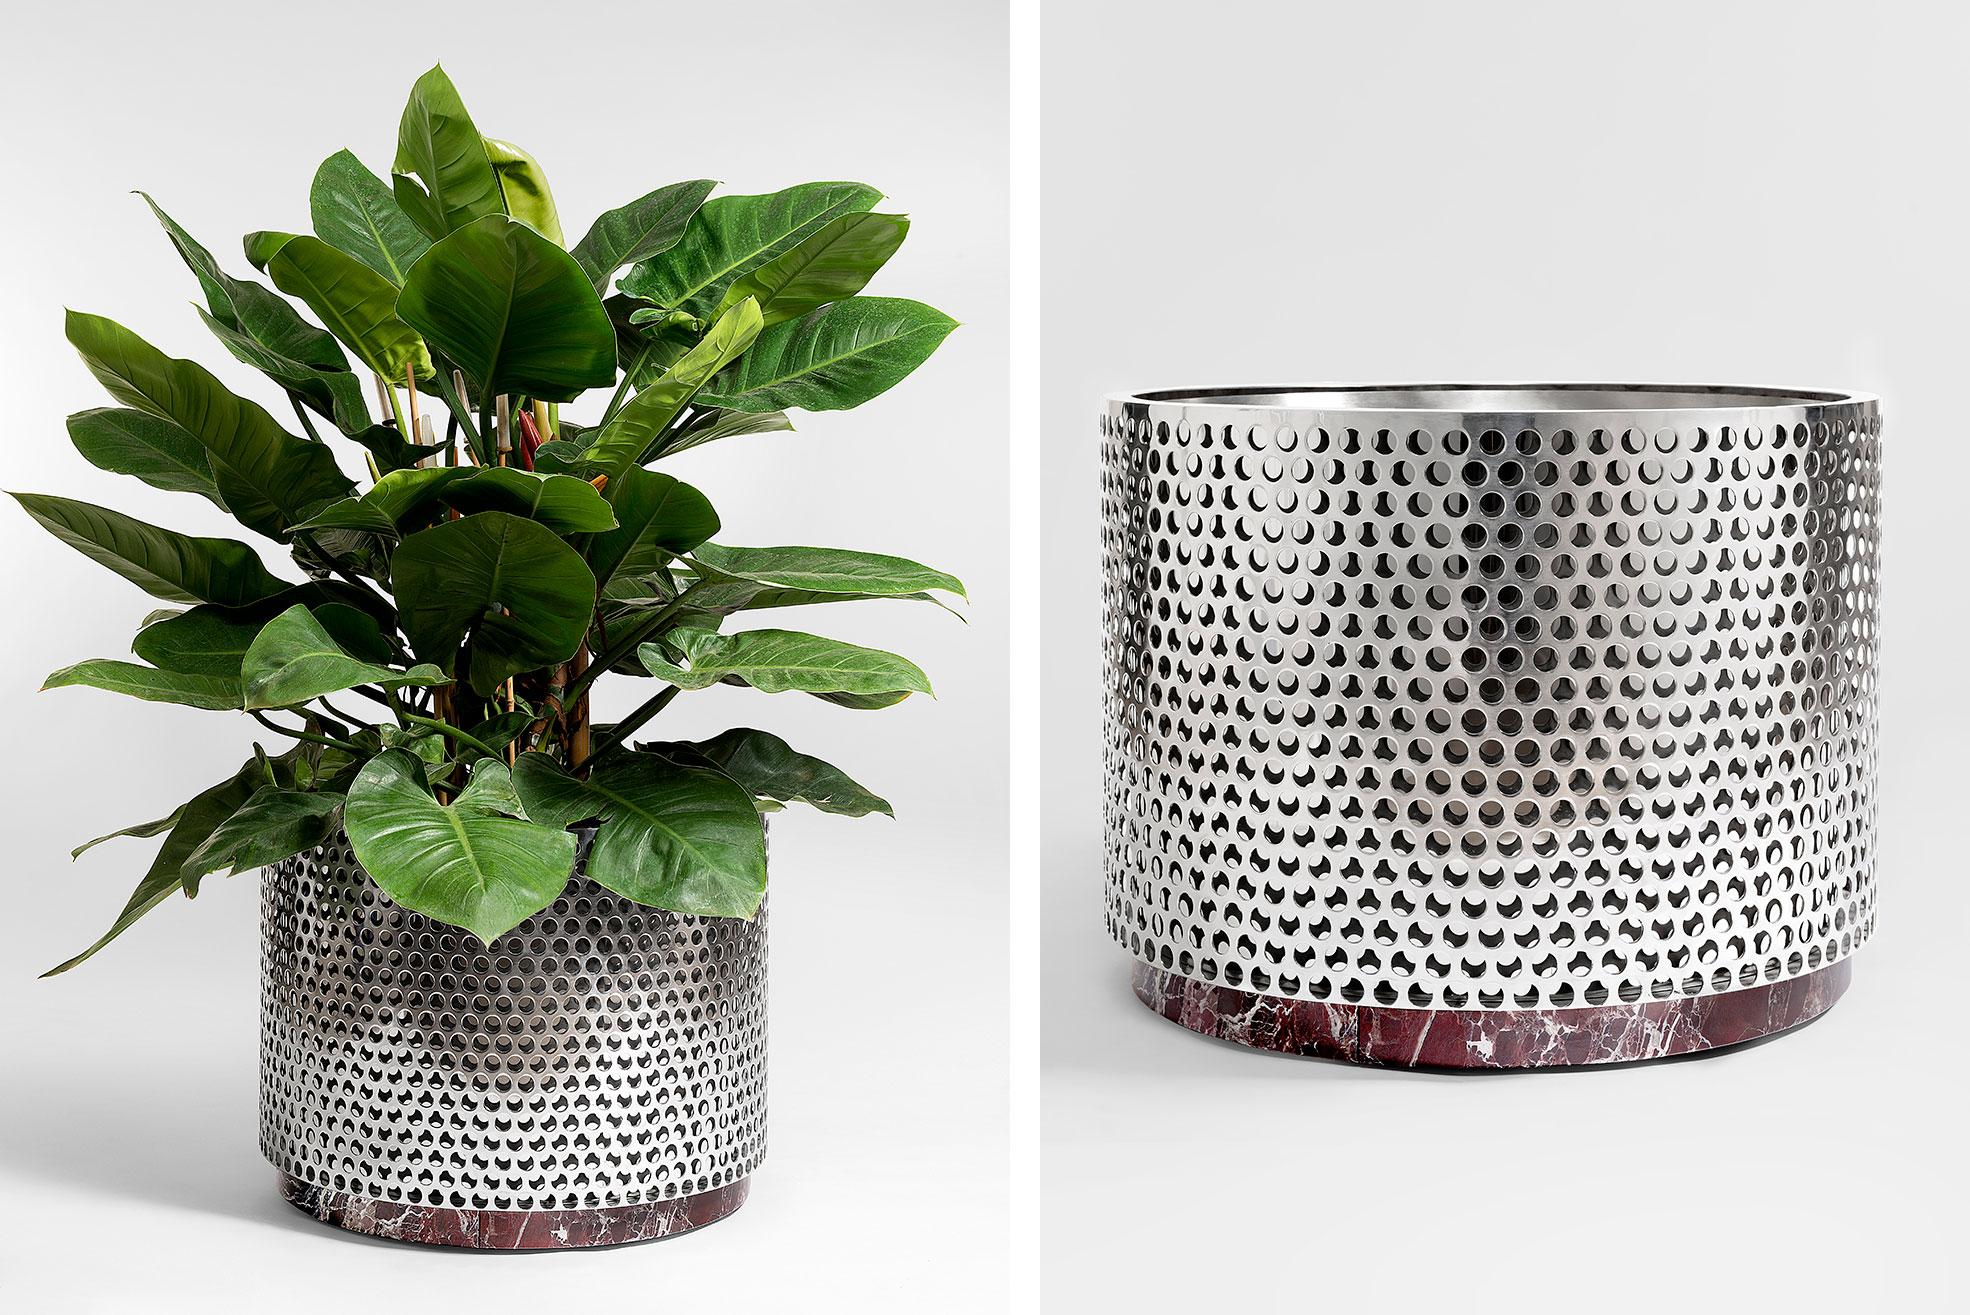 Metal Vase medium size with red marble design by Derek Castiglioni Photographer Maria Teresa Furnari